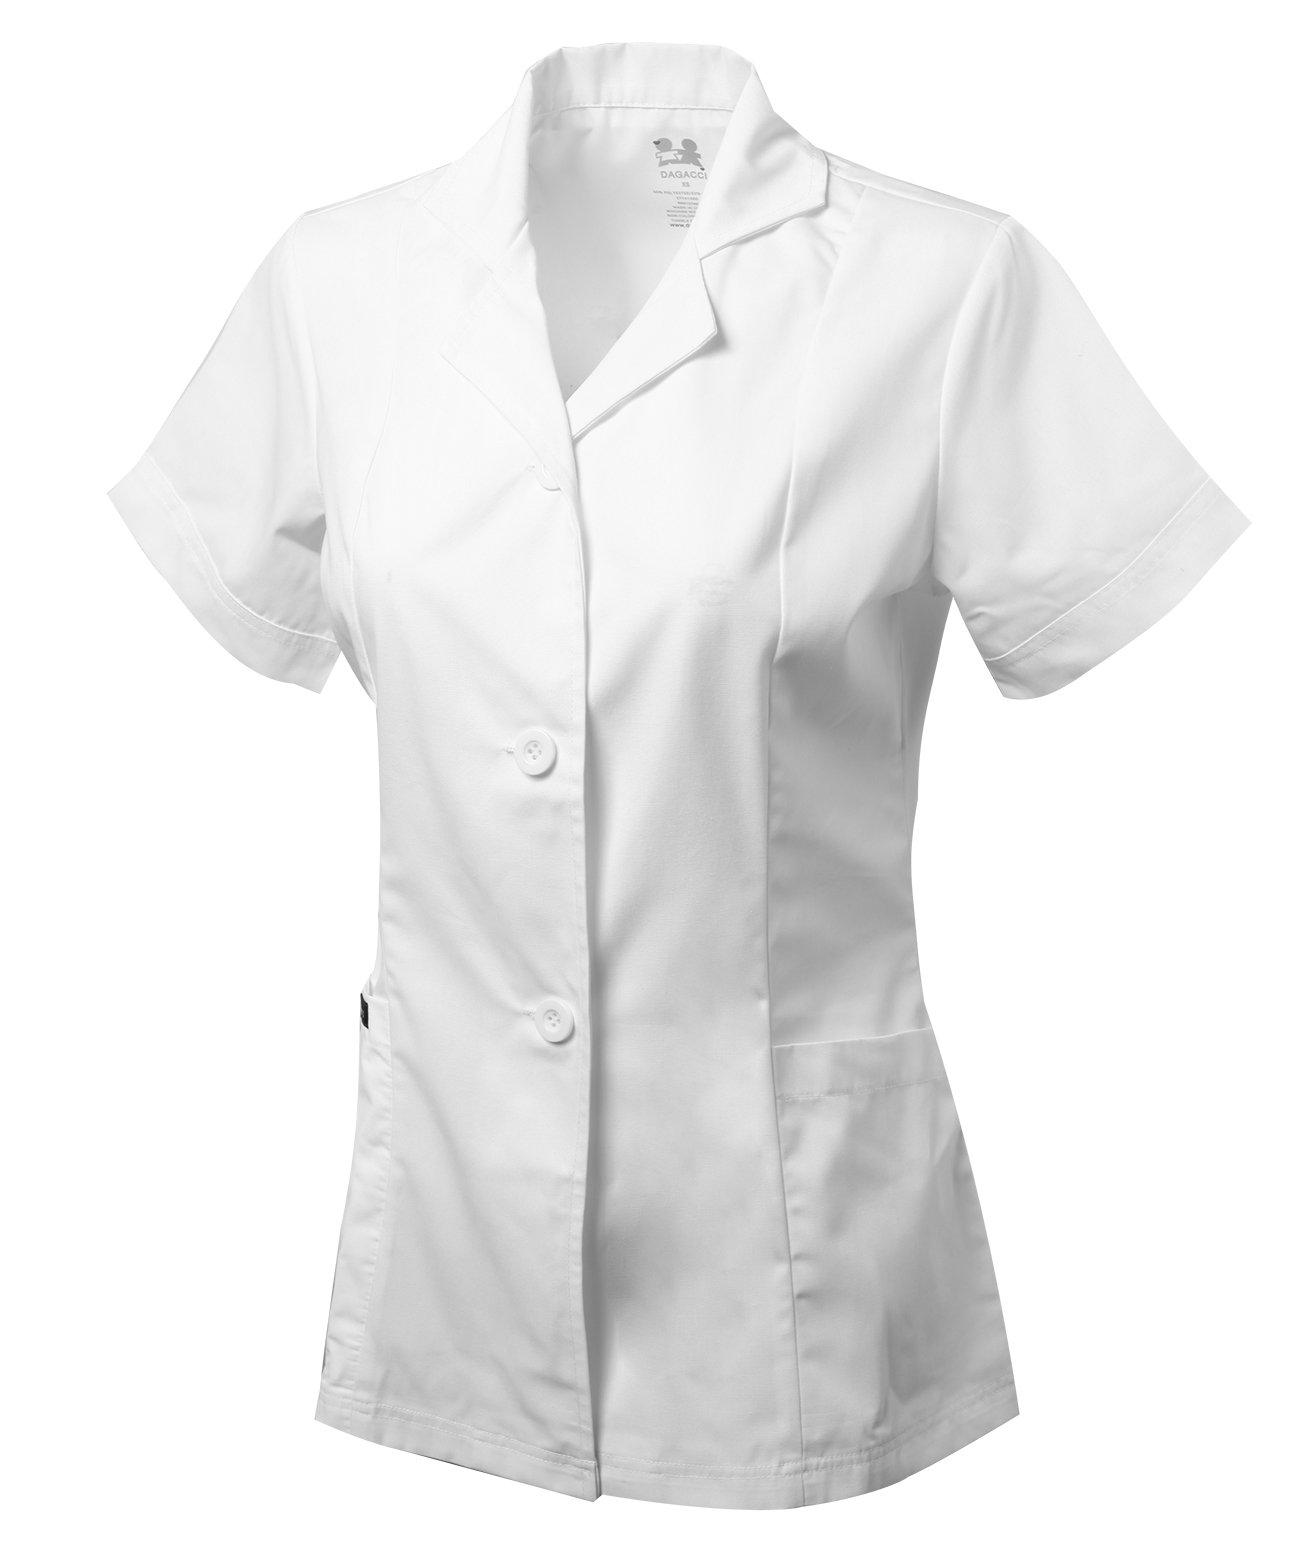 Dagacci Scrubs Medical Uniform Women's Chest Comfortable Short Sleeve Lab Coat (Small) by Dagacci Medical Uniform (Image #2)